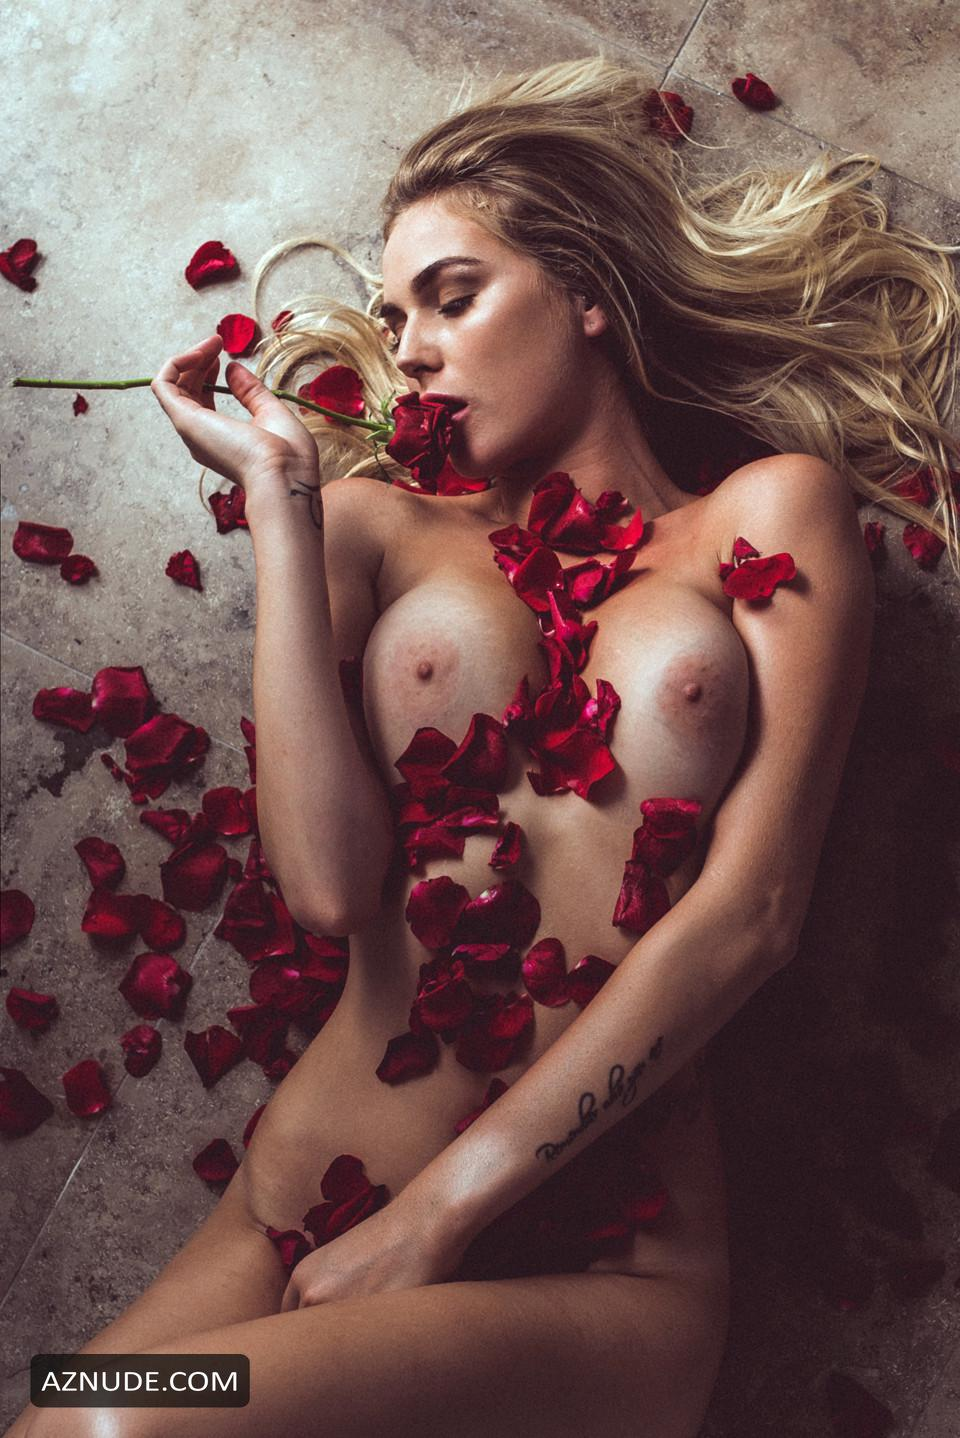 Justina valentine nude pics vids